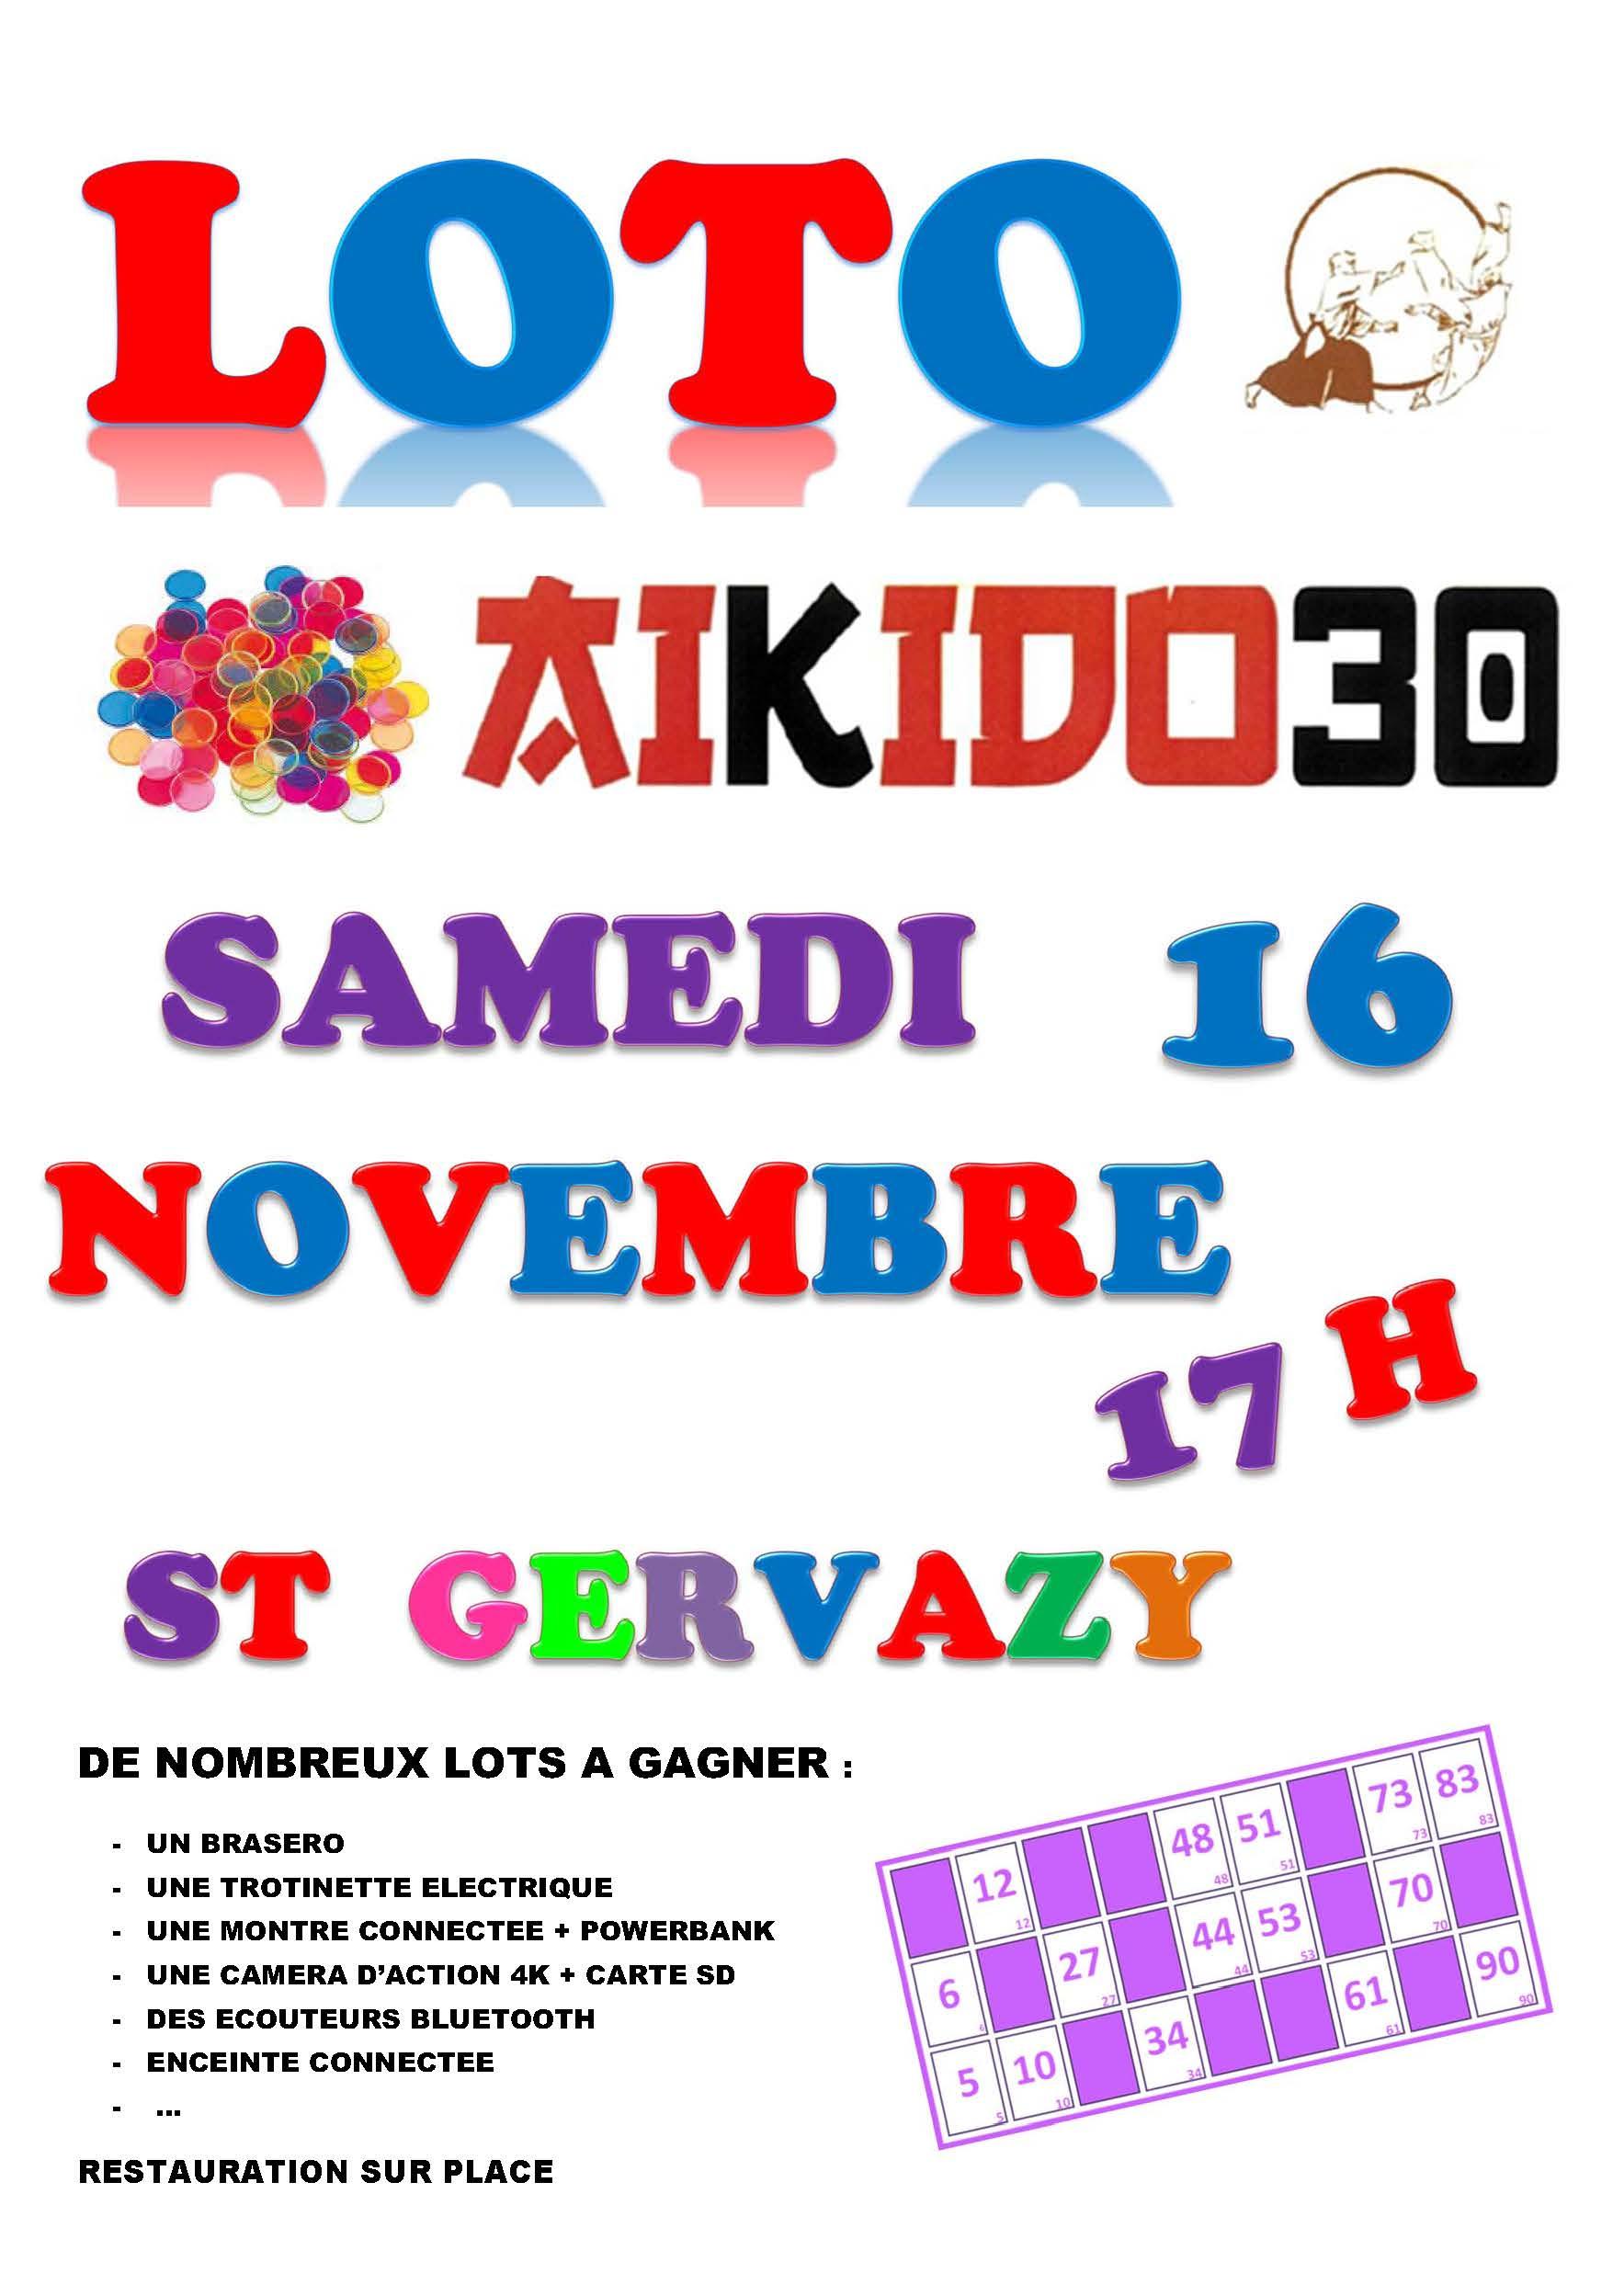 Loto Aikido30 samedi 16 novembre 17h  St Gervasy